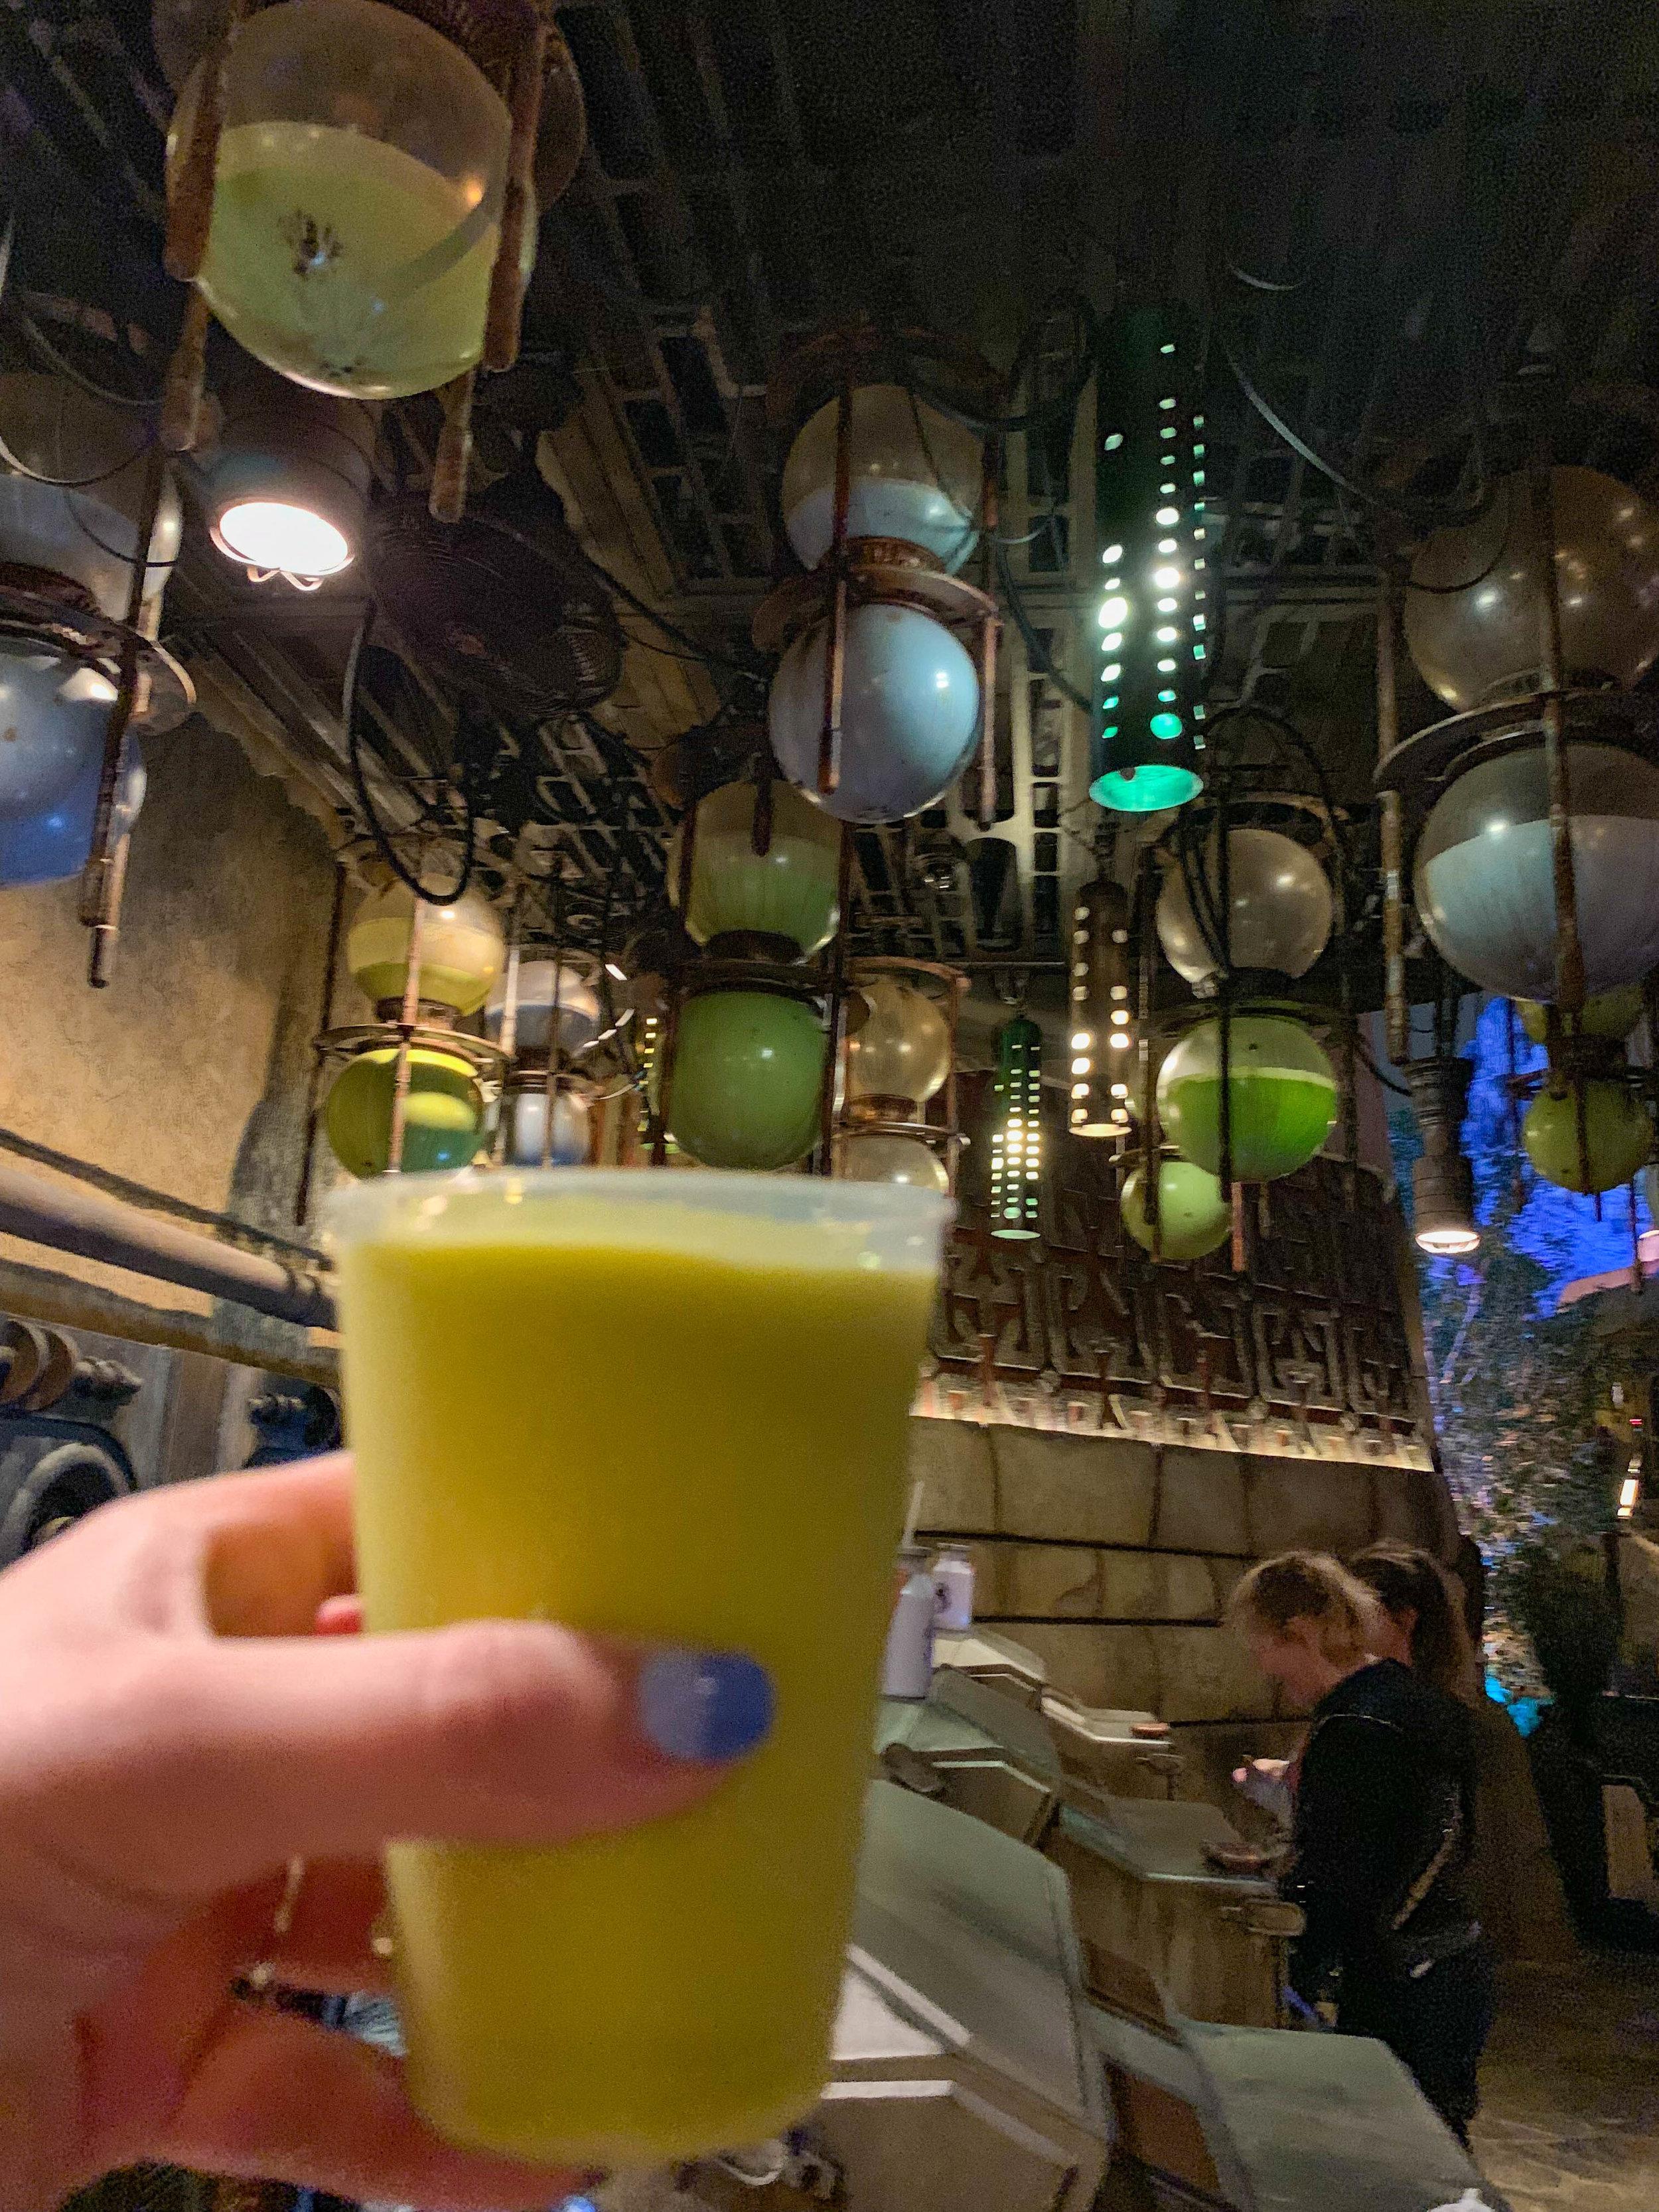 Star Wars Land - Galaxys Edge Disneyland green milk